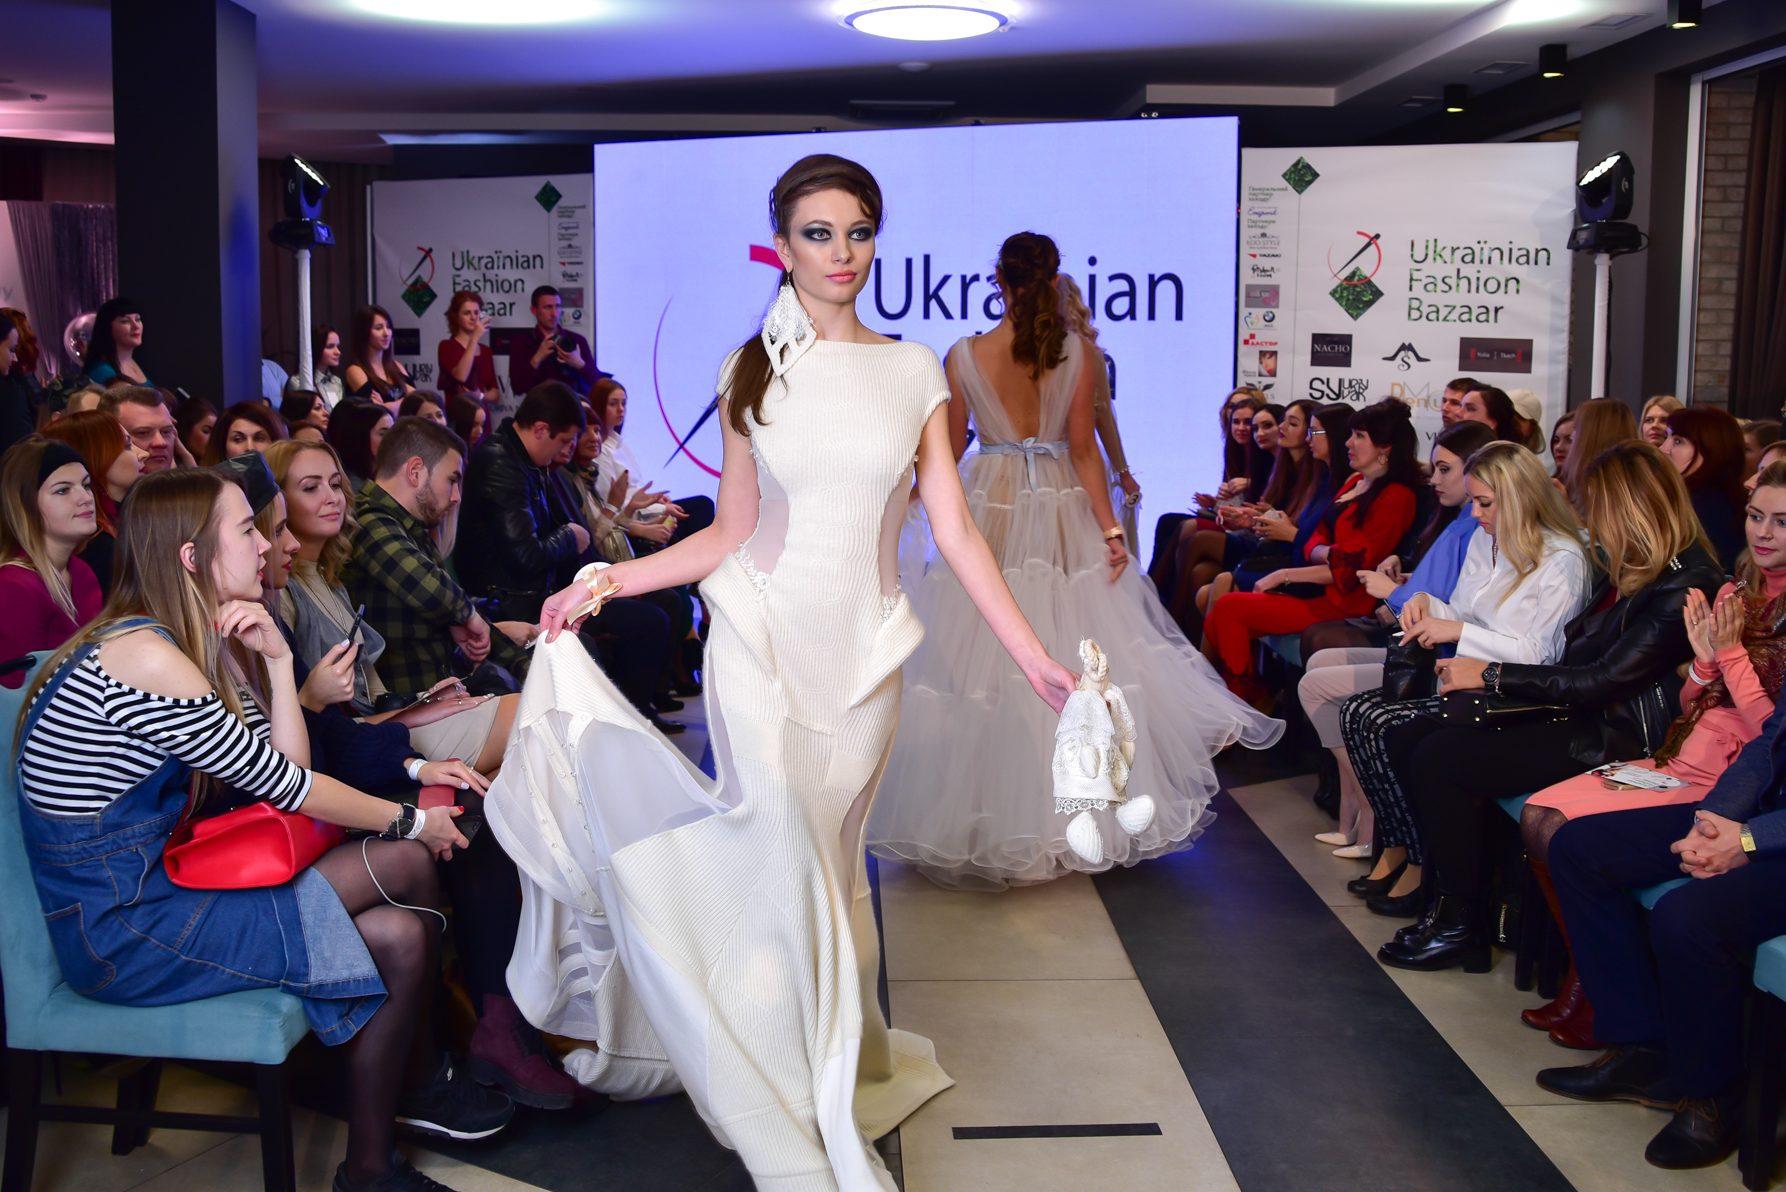 Ukraїnian Fashion Bazaar